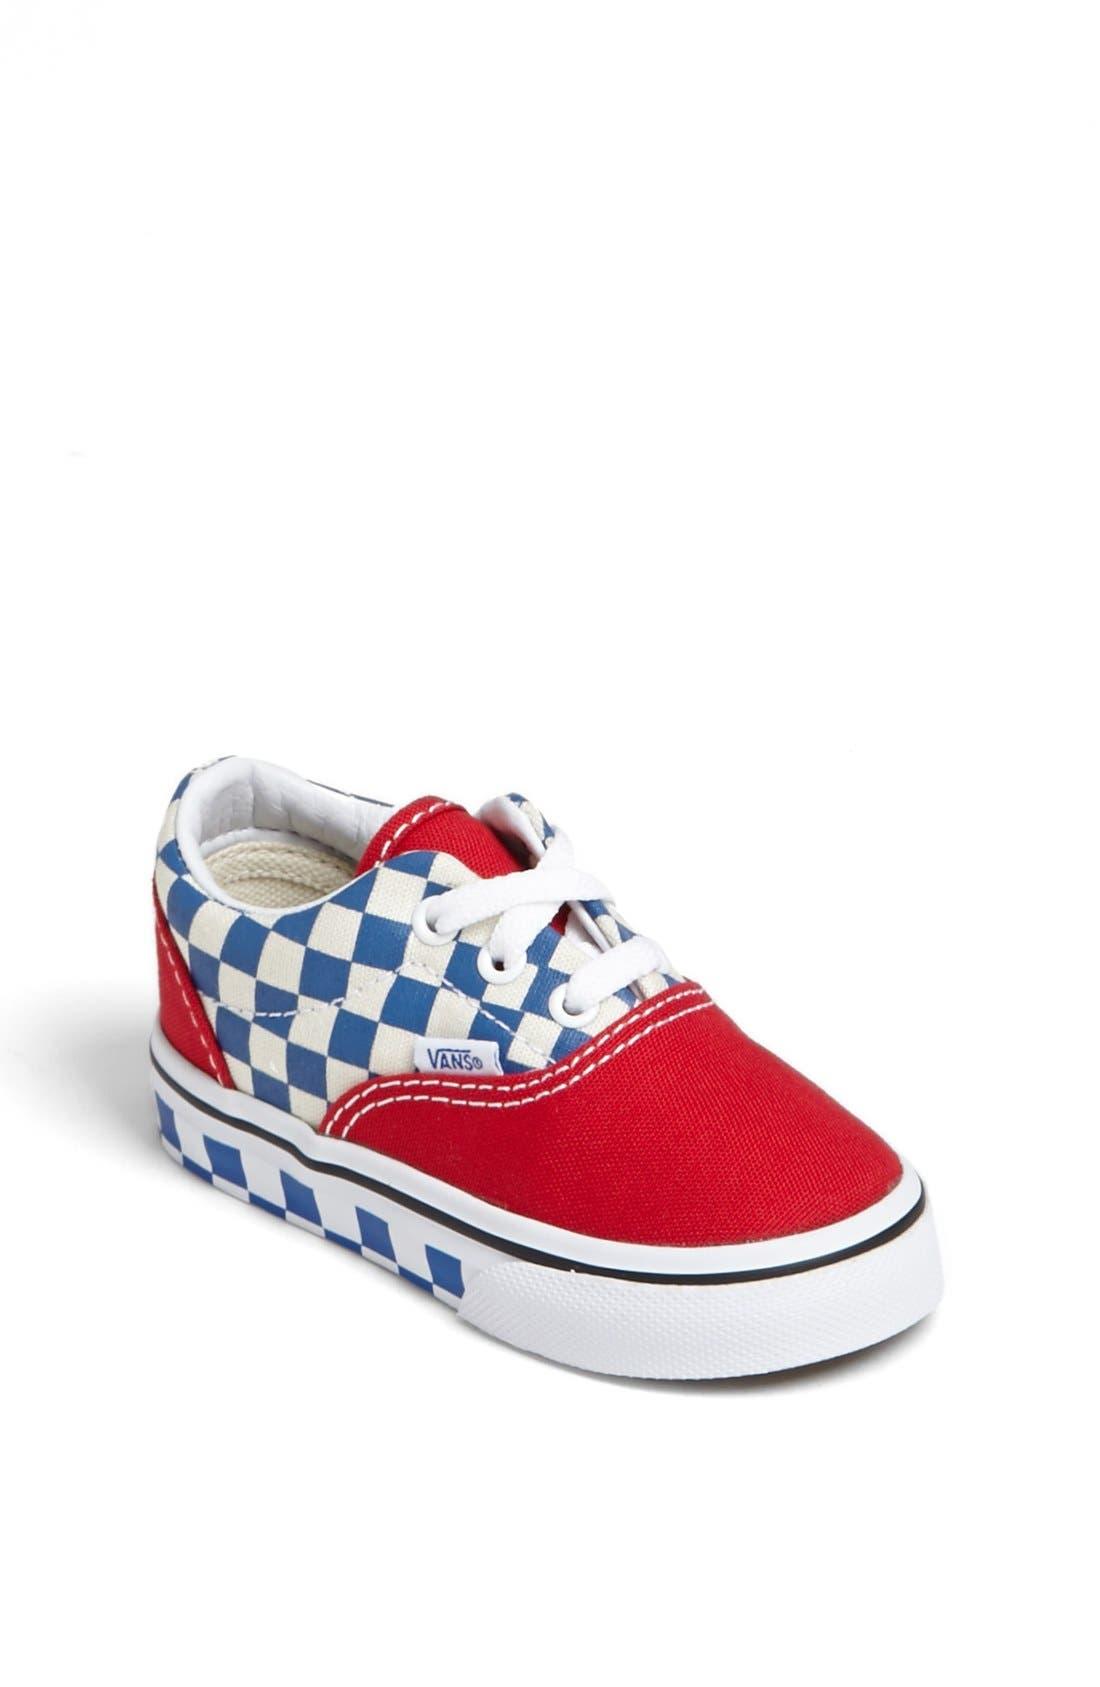 Alternate Image 1 Selected - Vans 'Era - Checkerboard' Sneaker (Baby, Walker & Toddler)